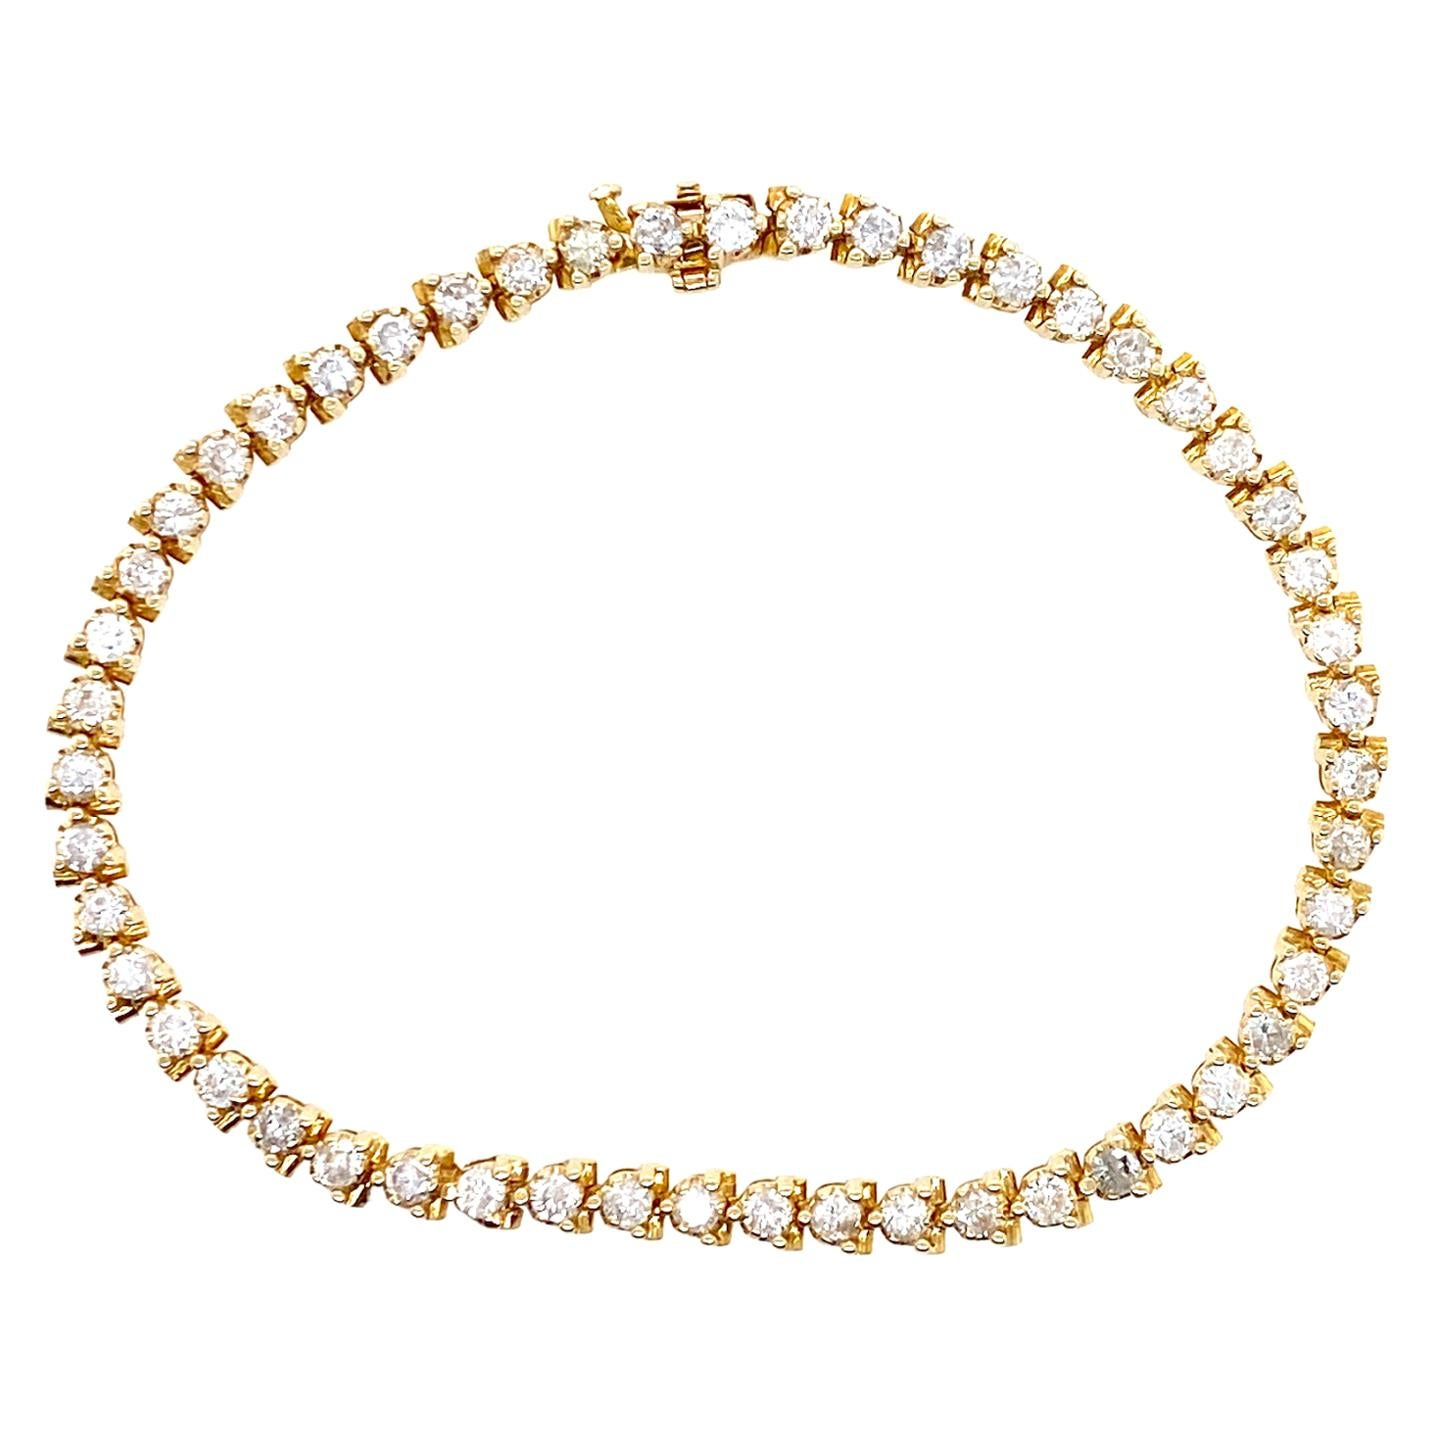 2.50 Carat Diamond Tennis Bracelet 14 Karat Yellow Gold